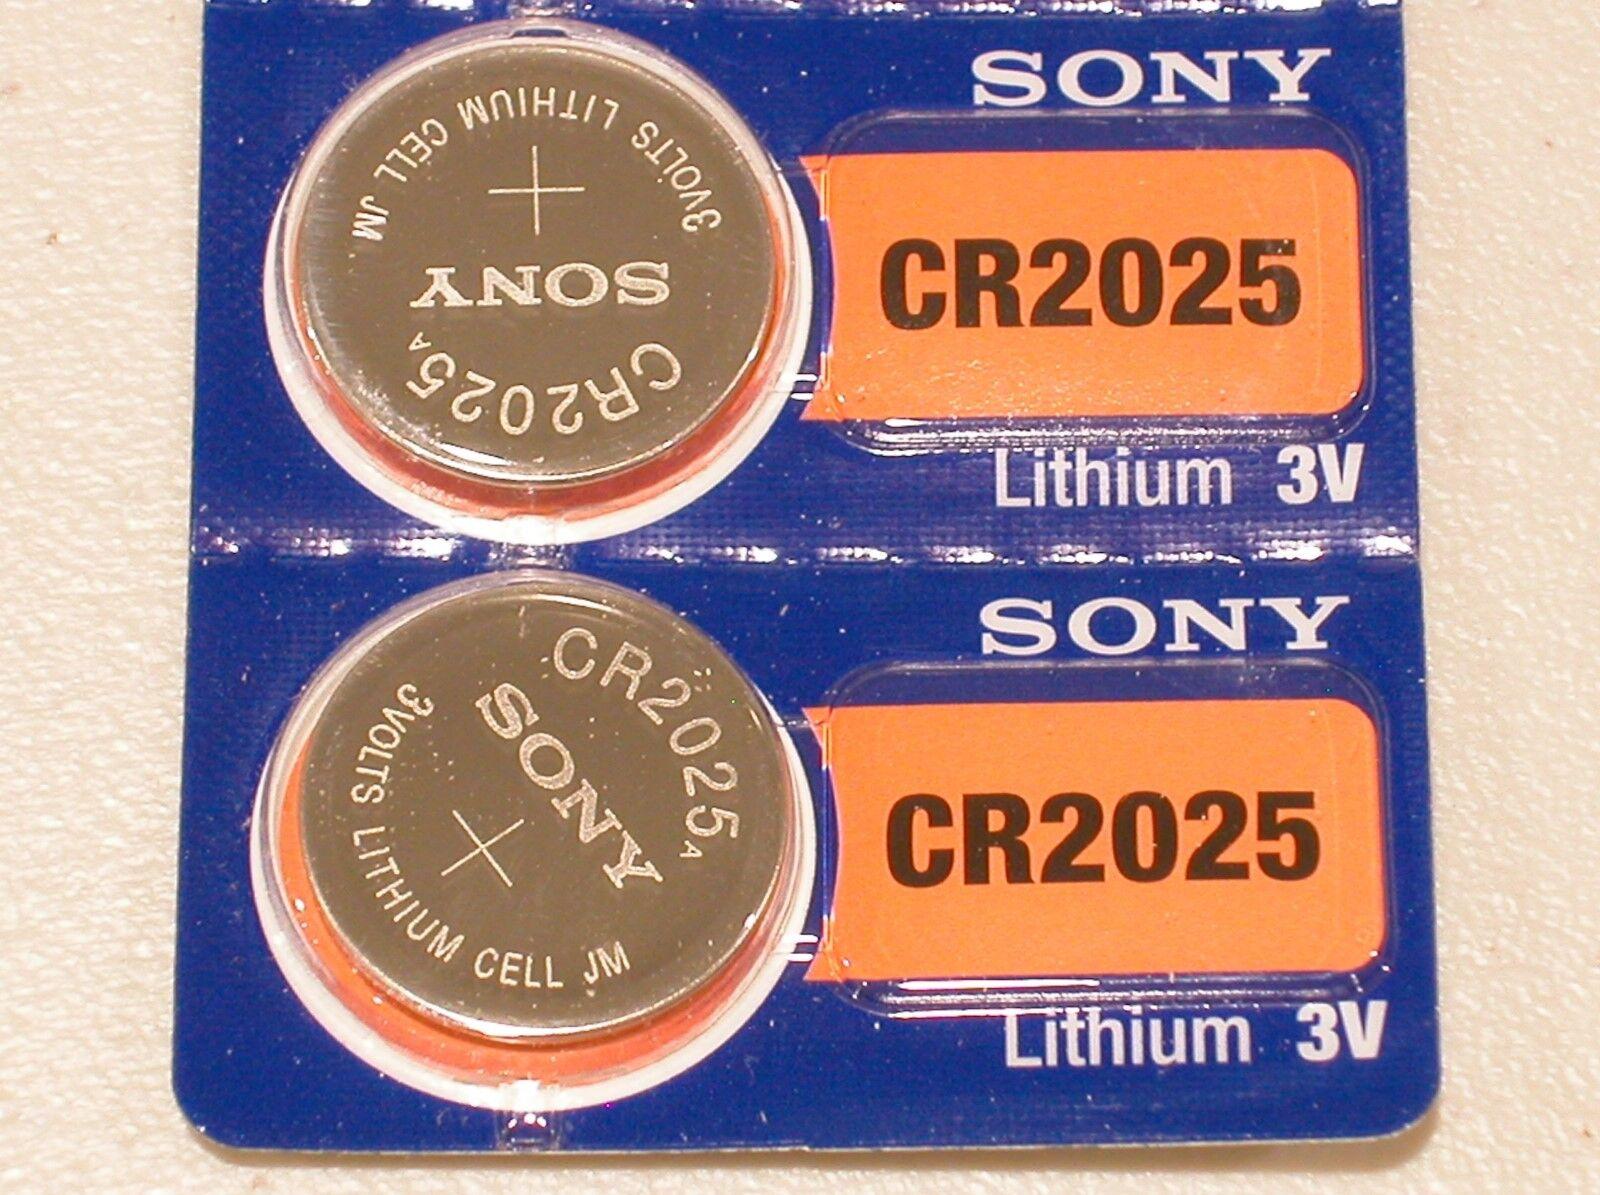 Купить 2 pc SONY cr2025 lithium 3v battery cr 2025  EXPIRATION 2026